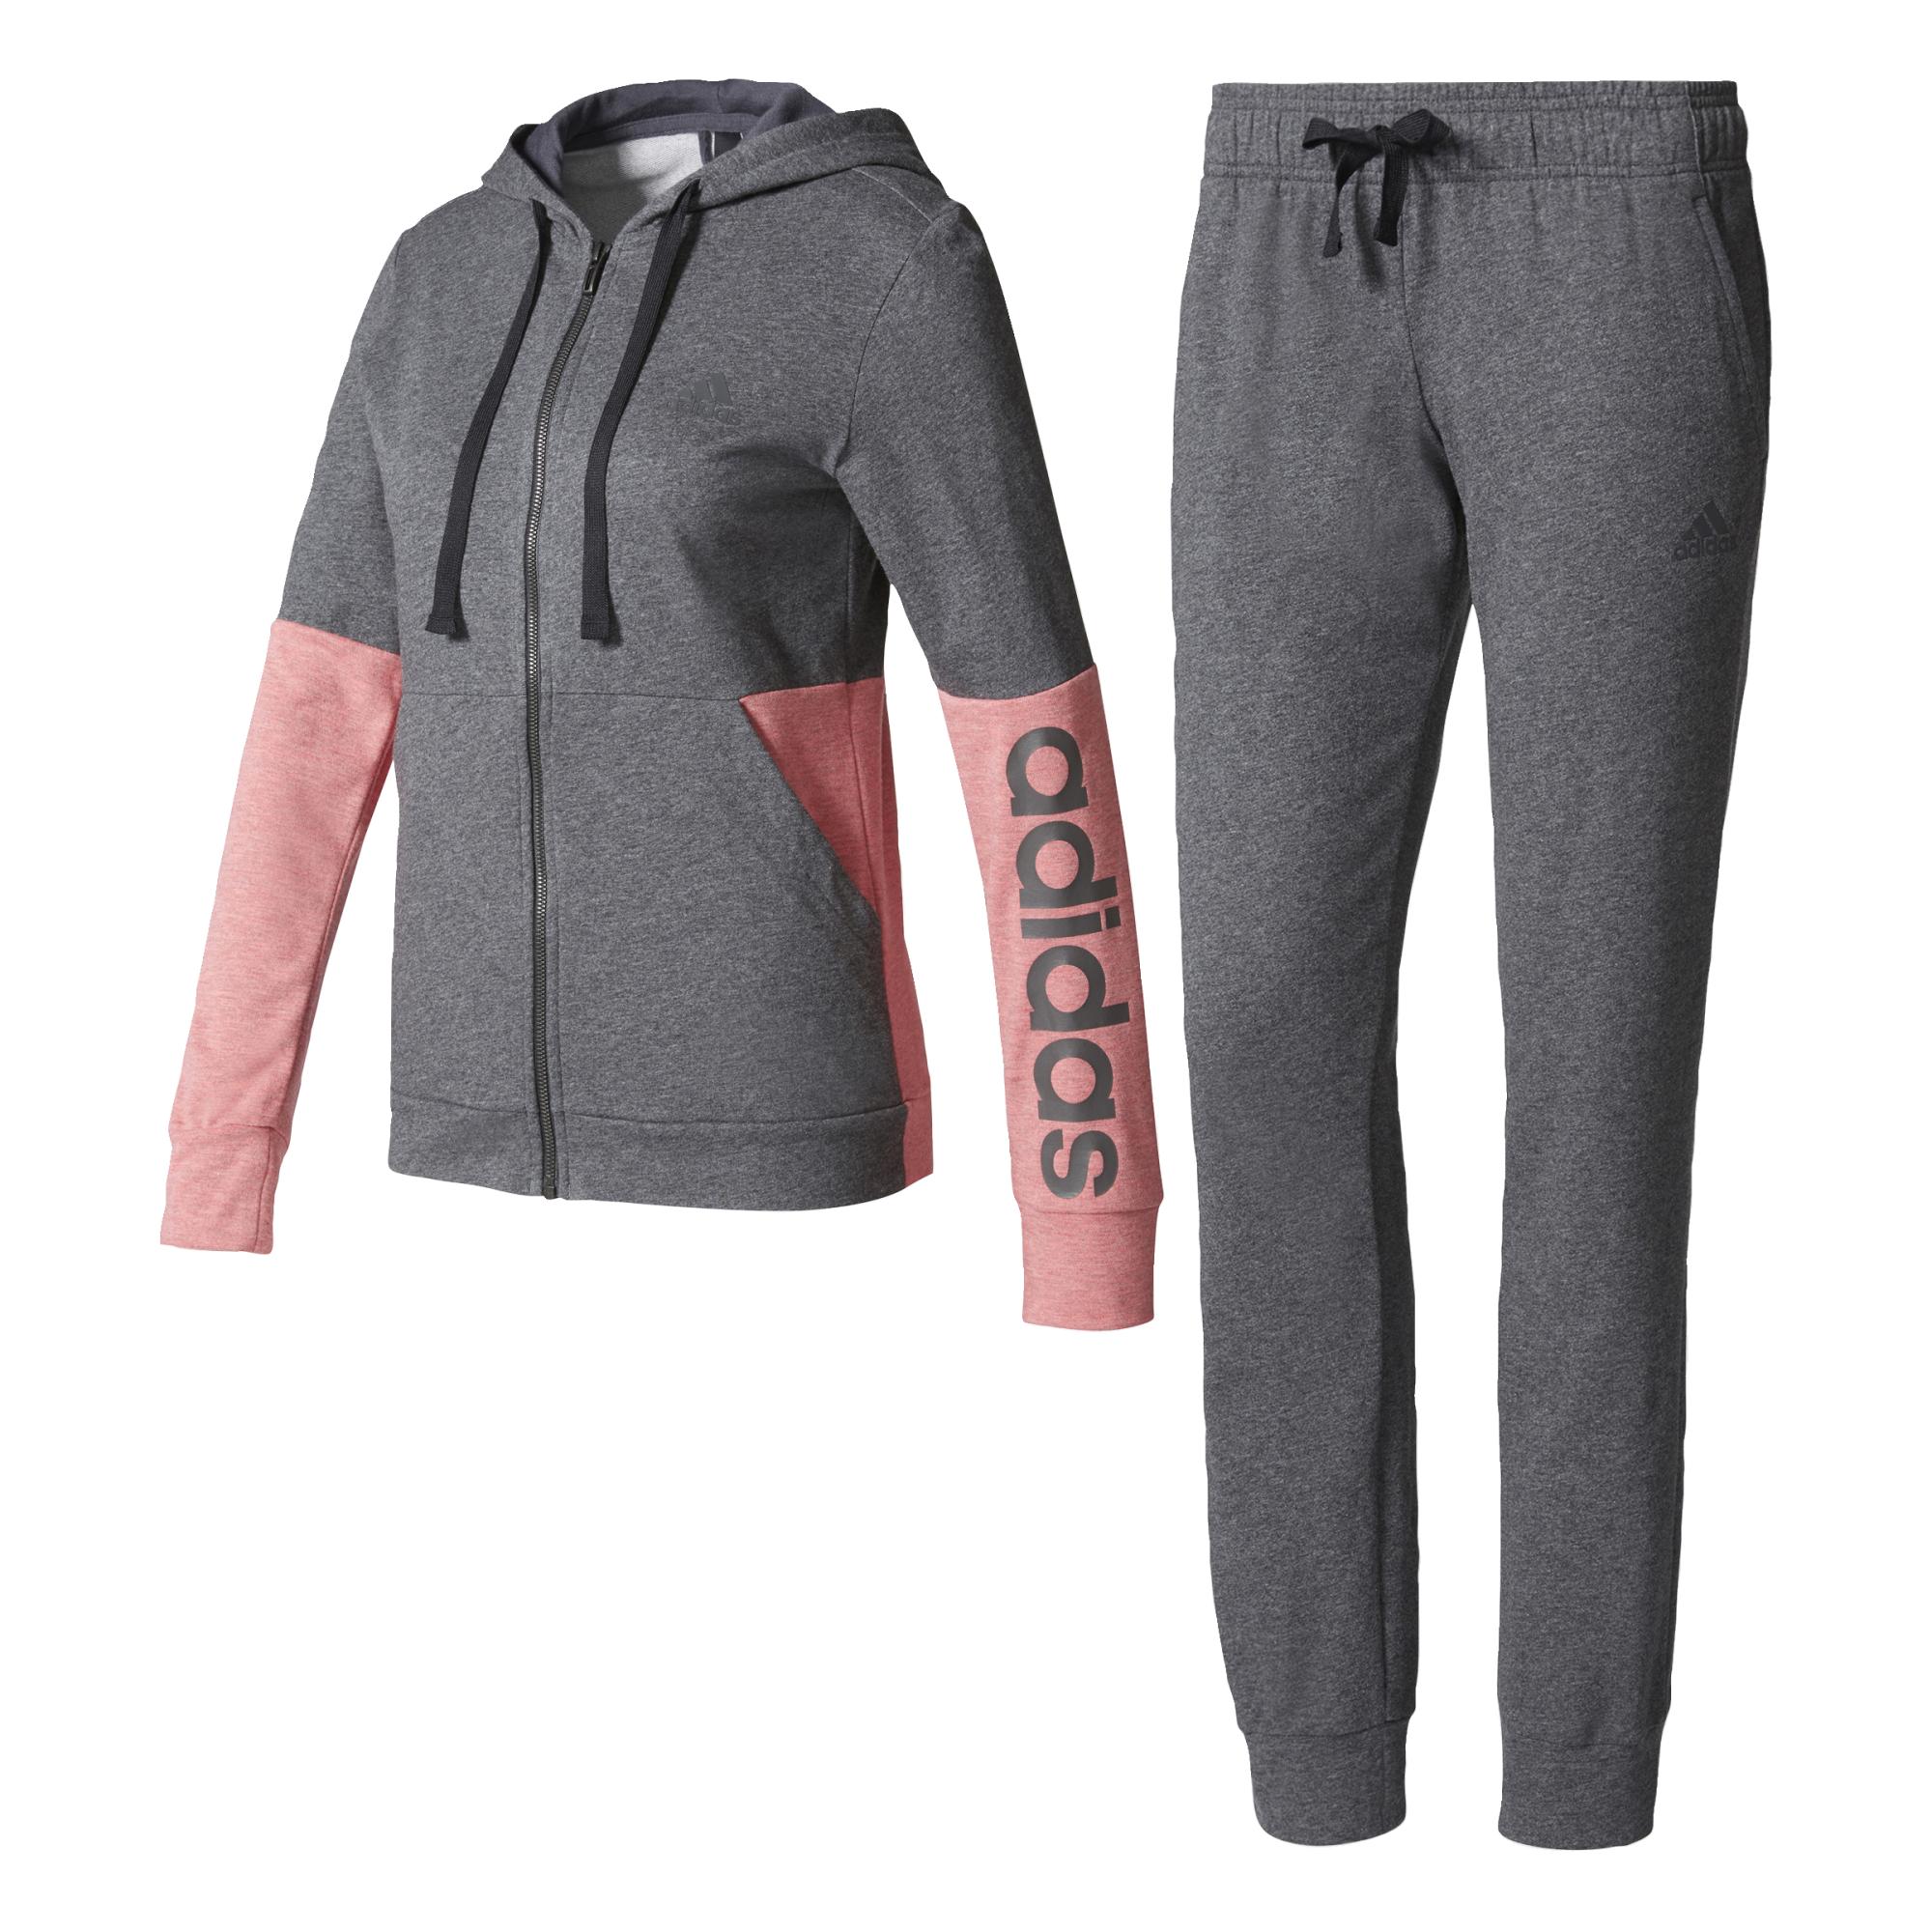 ae01923622 Adidas jogging , Női ruházat | melegitő , adidas_performance , Adidas  jogging